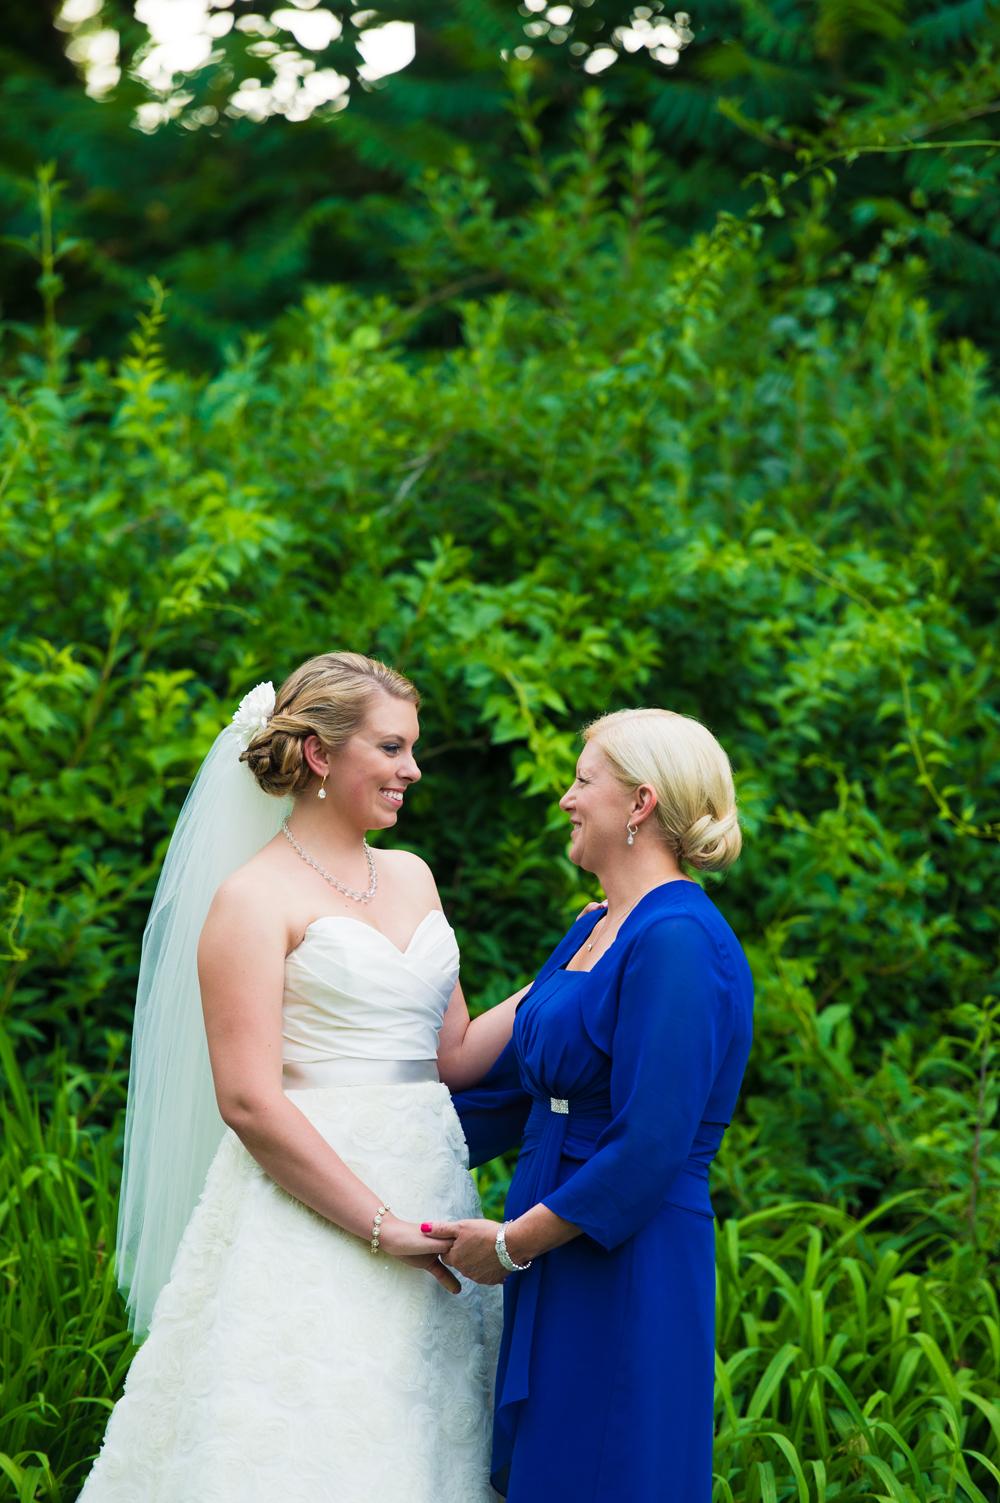 Tarrywile-Mansion-Wedding-Greg-Lewis-Photo-62